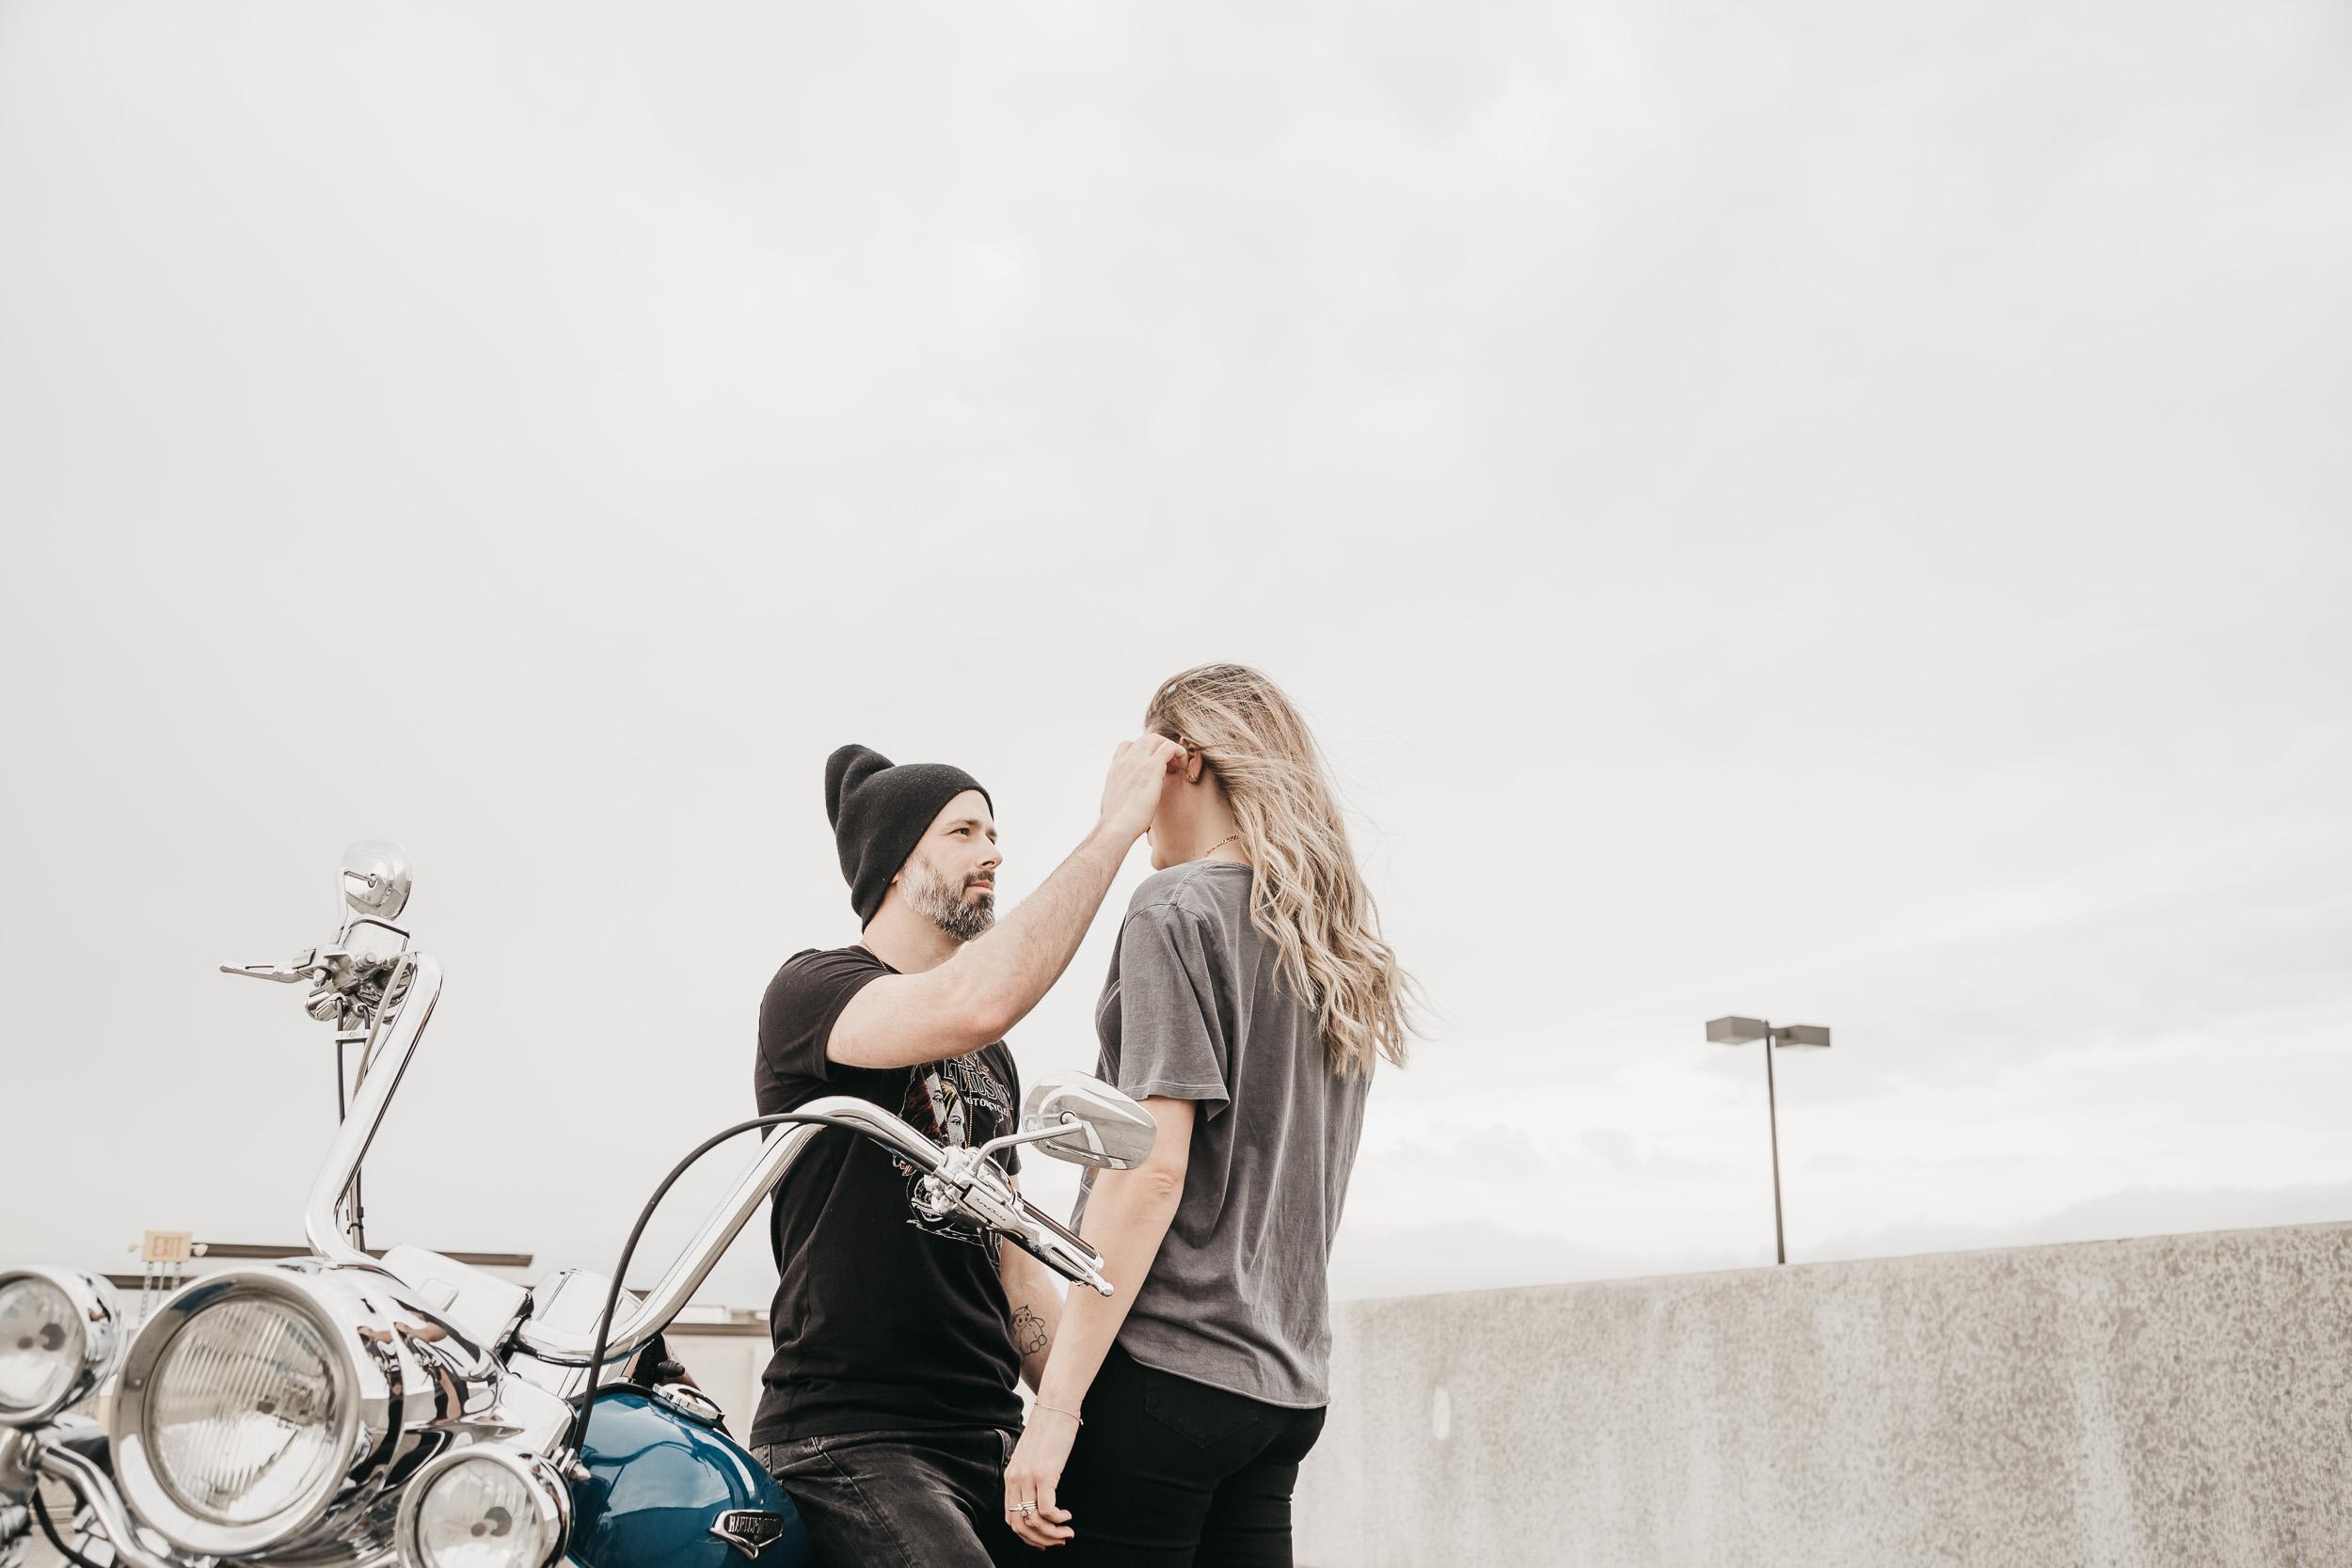 Orlando-Elopement-Engagement-Photographer-206.jpg